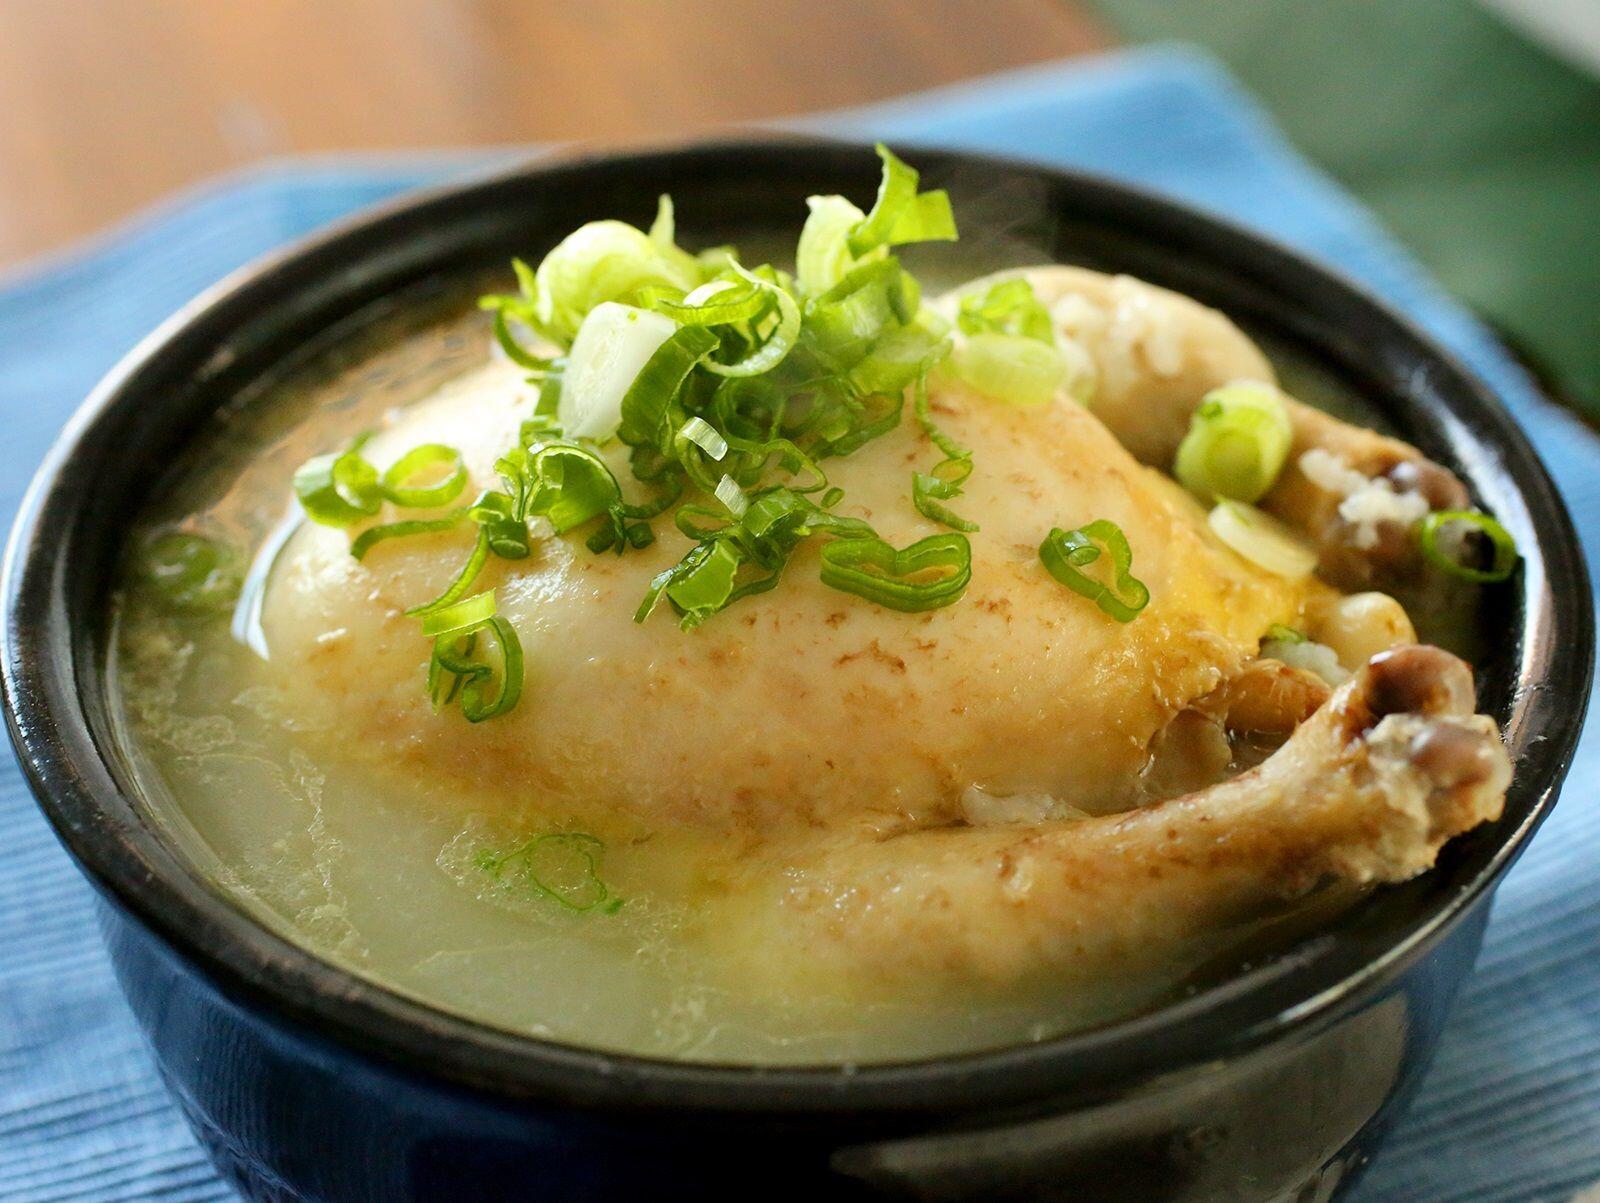 Resep Samgyetang, Ayam Rebus ala Korea yang Sehat untuk Lauk Sahur